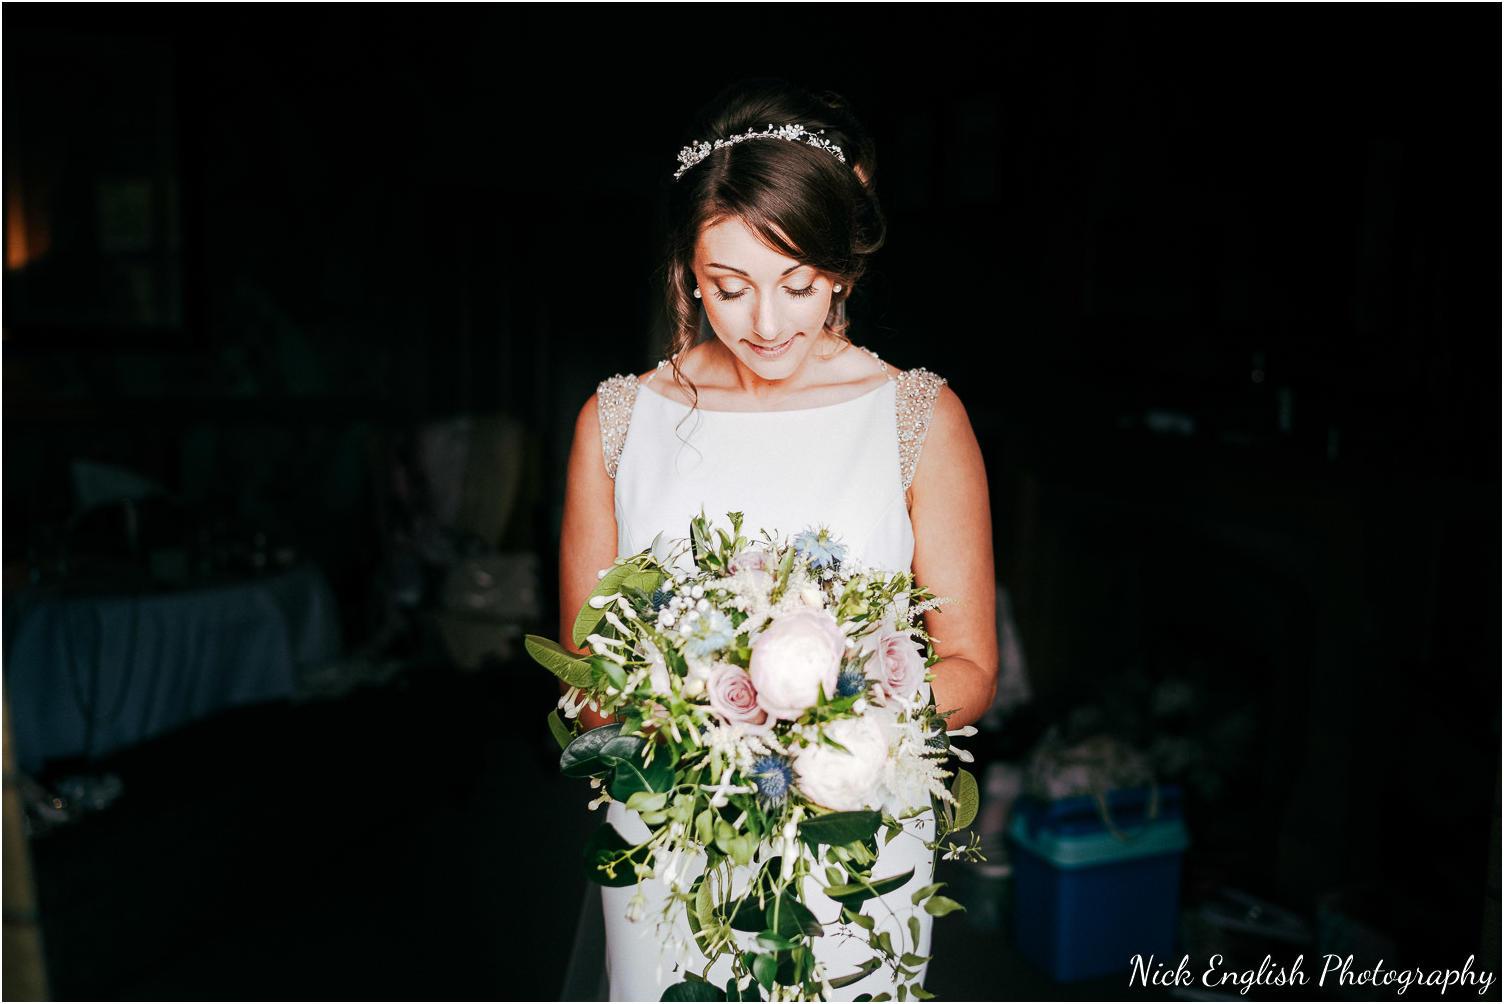 Mitton_Hall_Wedding_Summer_Photograph-28.jpg